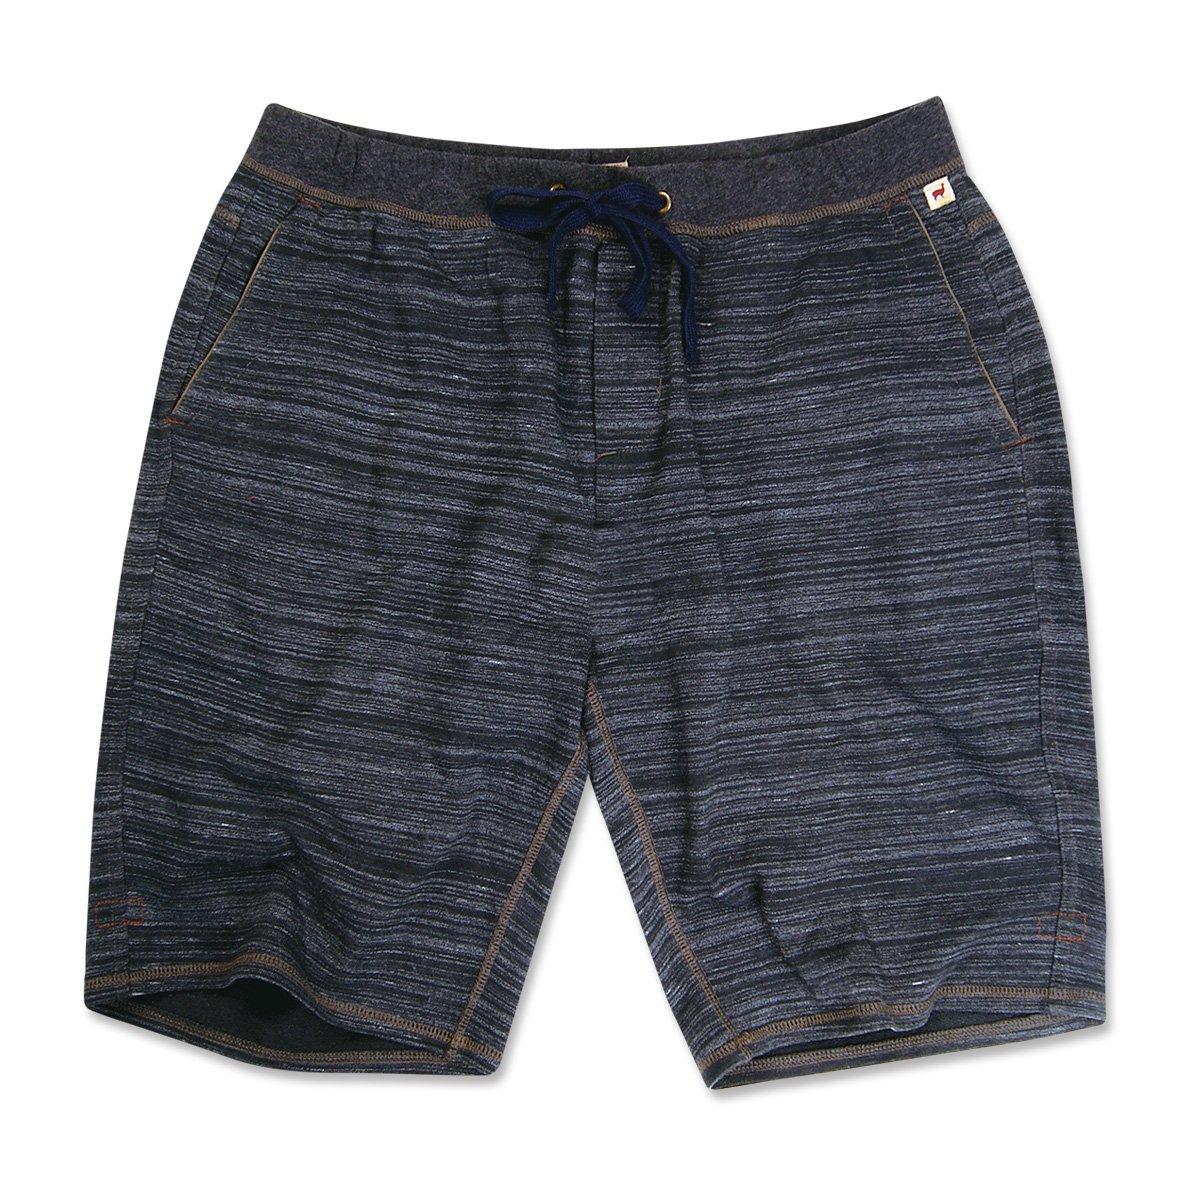 ZENFARI Lazy Shorts Charcoal Extra Large